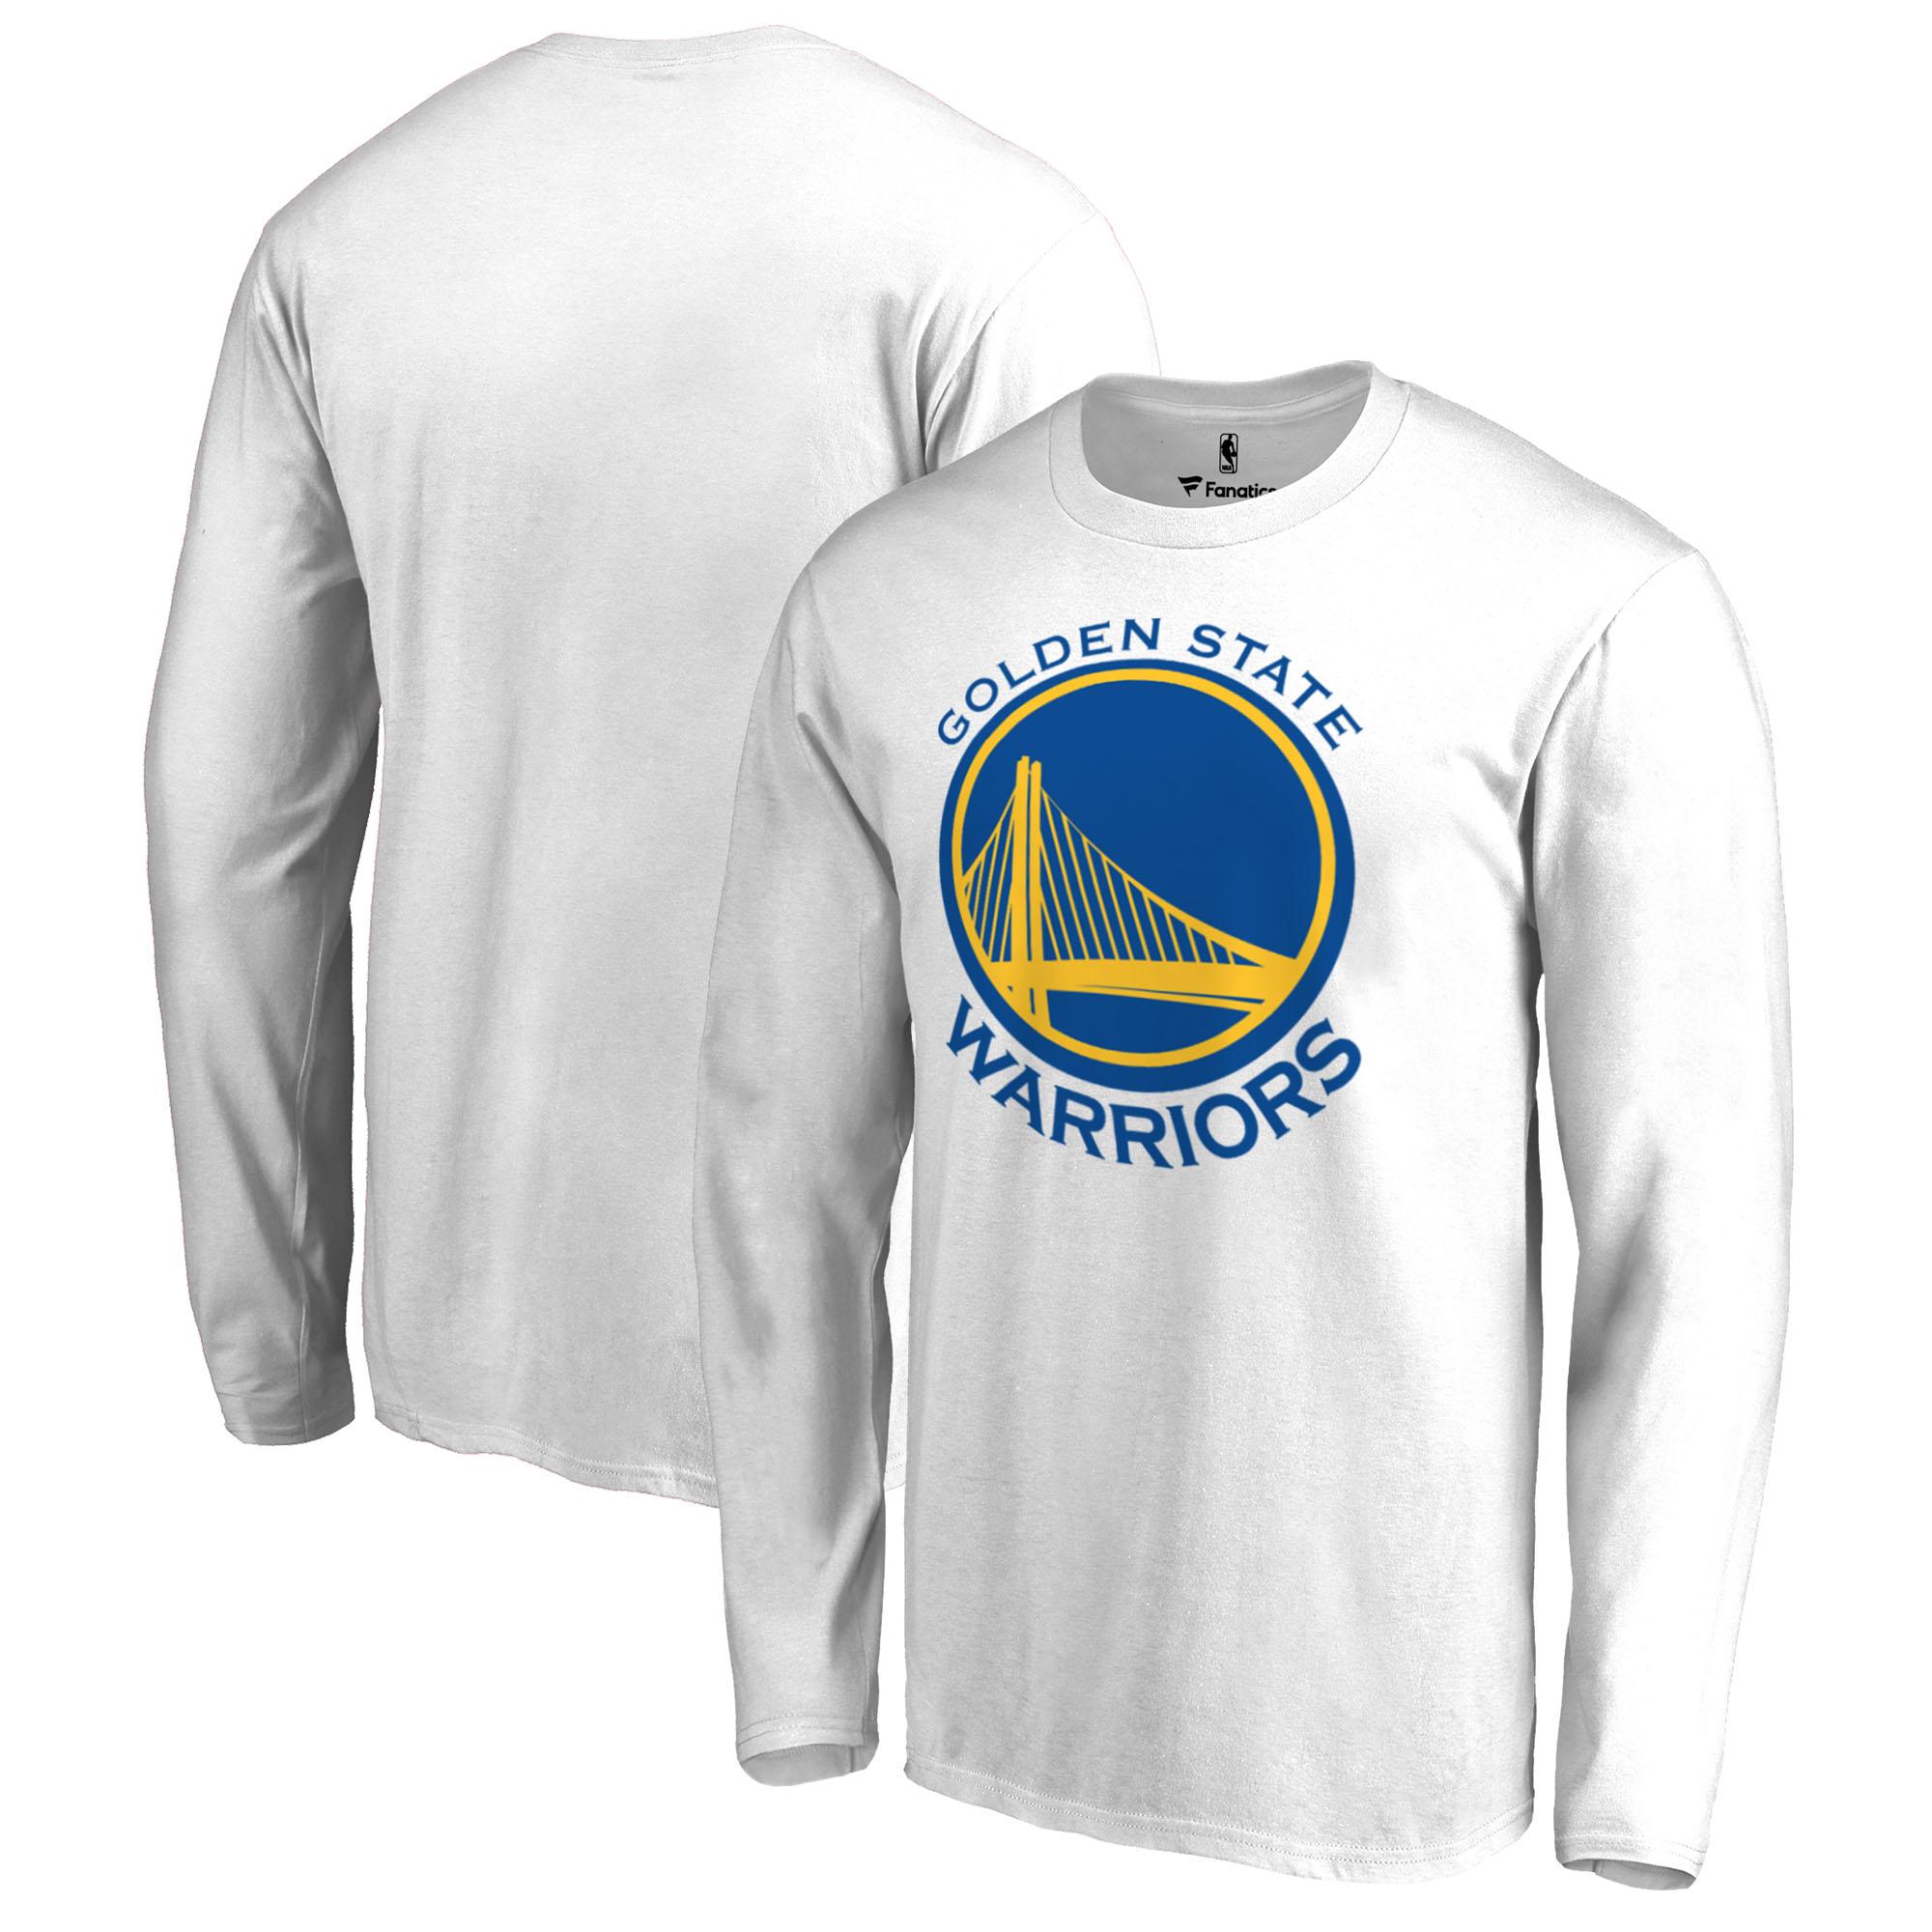 Golden State Warriors Fanatics Branded Primary Logo Long Sleeve T-Shirt - White